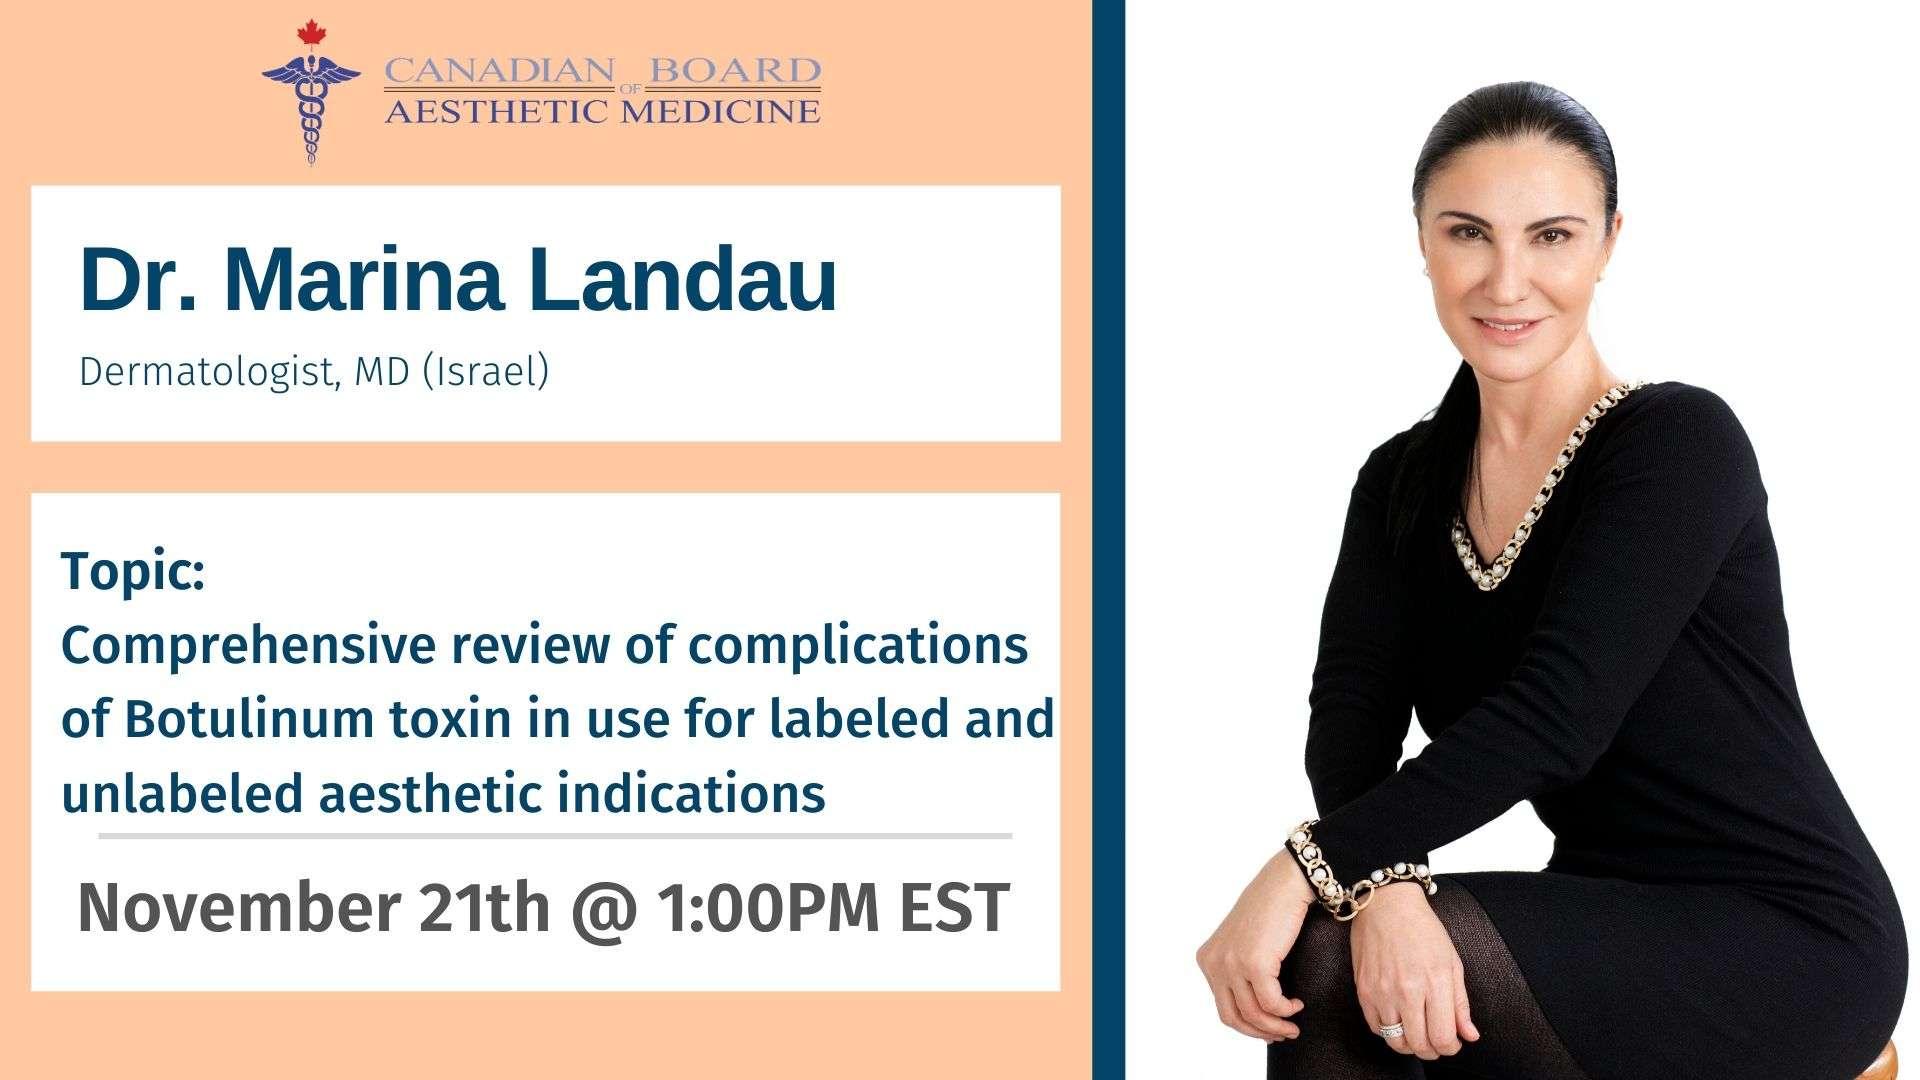 Marina Landau, Injectables, CBAM, Botox, Filler, Cadaver, Lab, Education, Master, Basic, Advance